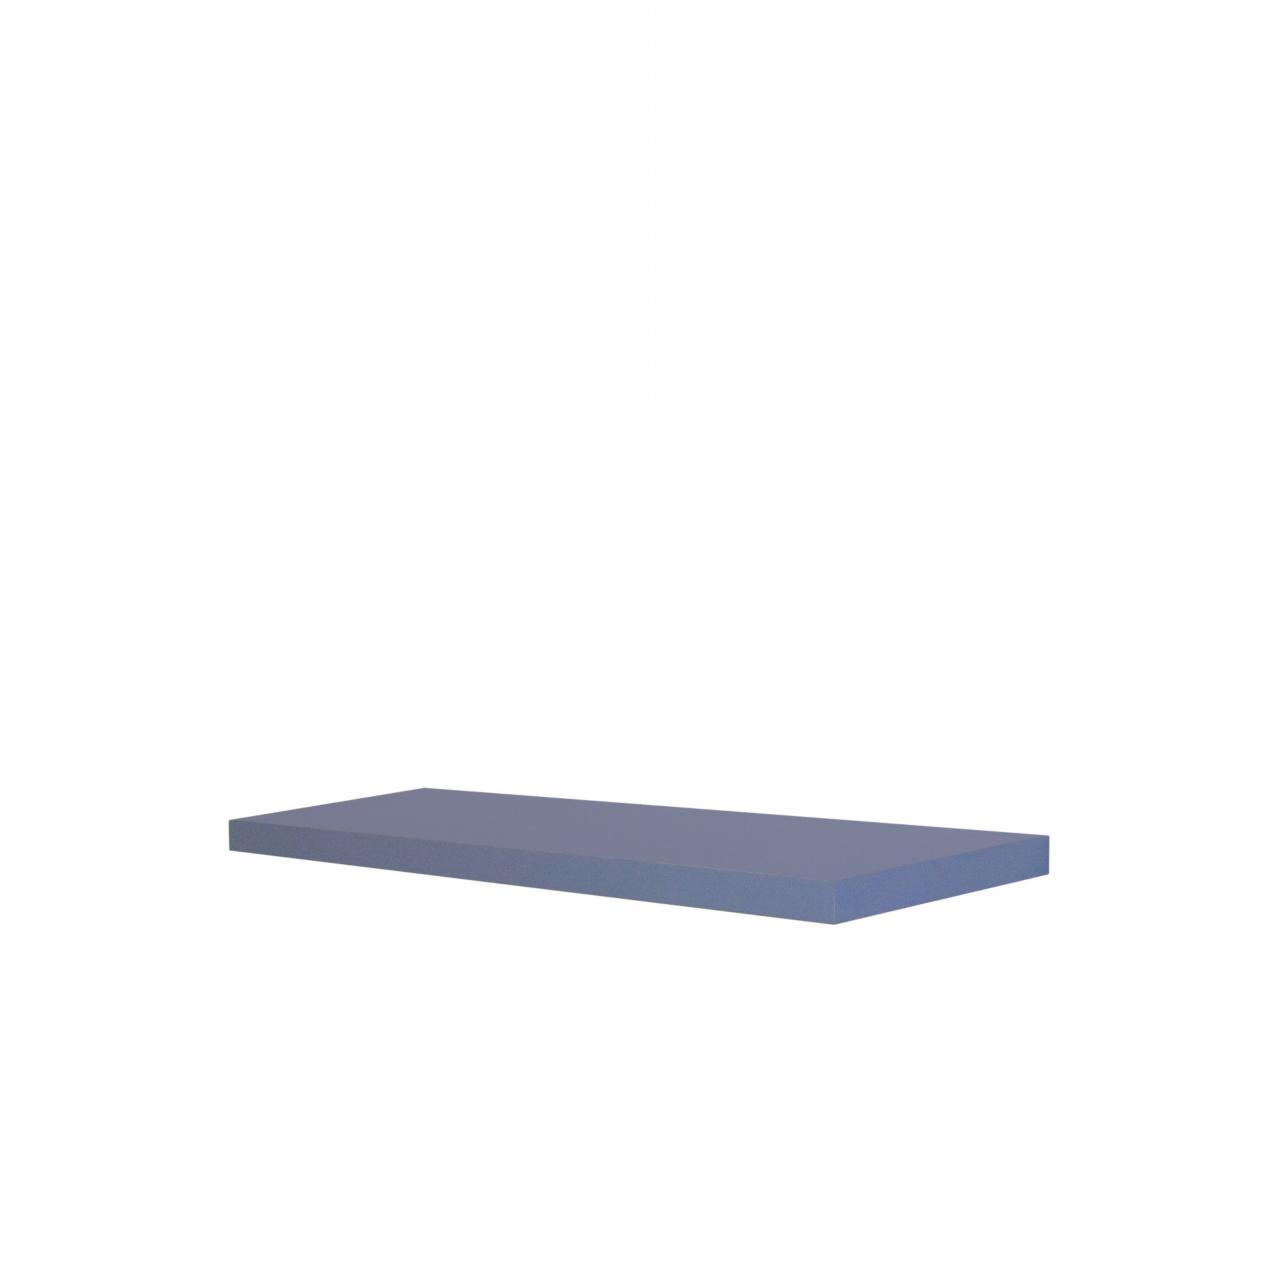 Wandsteckboard 90 cm Himmelblau